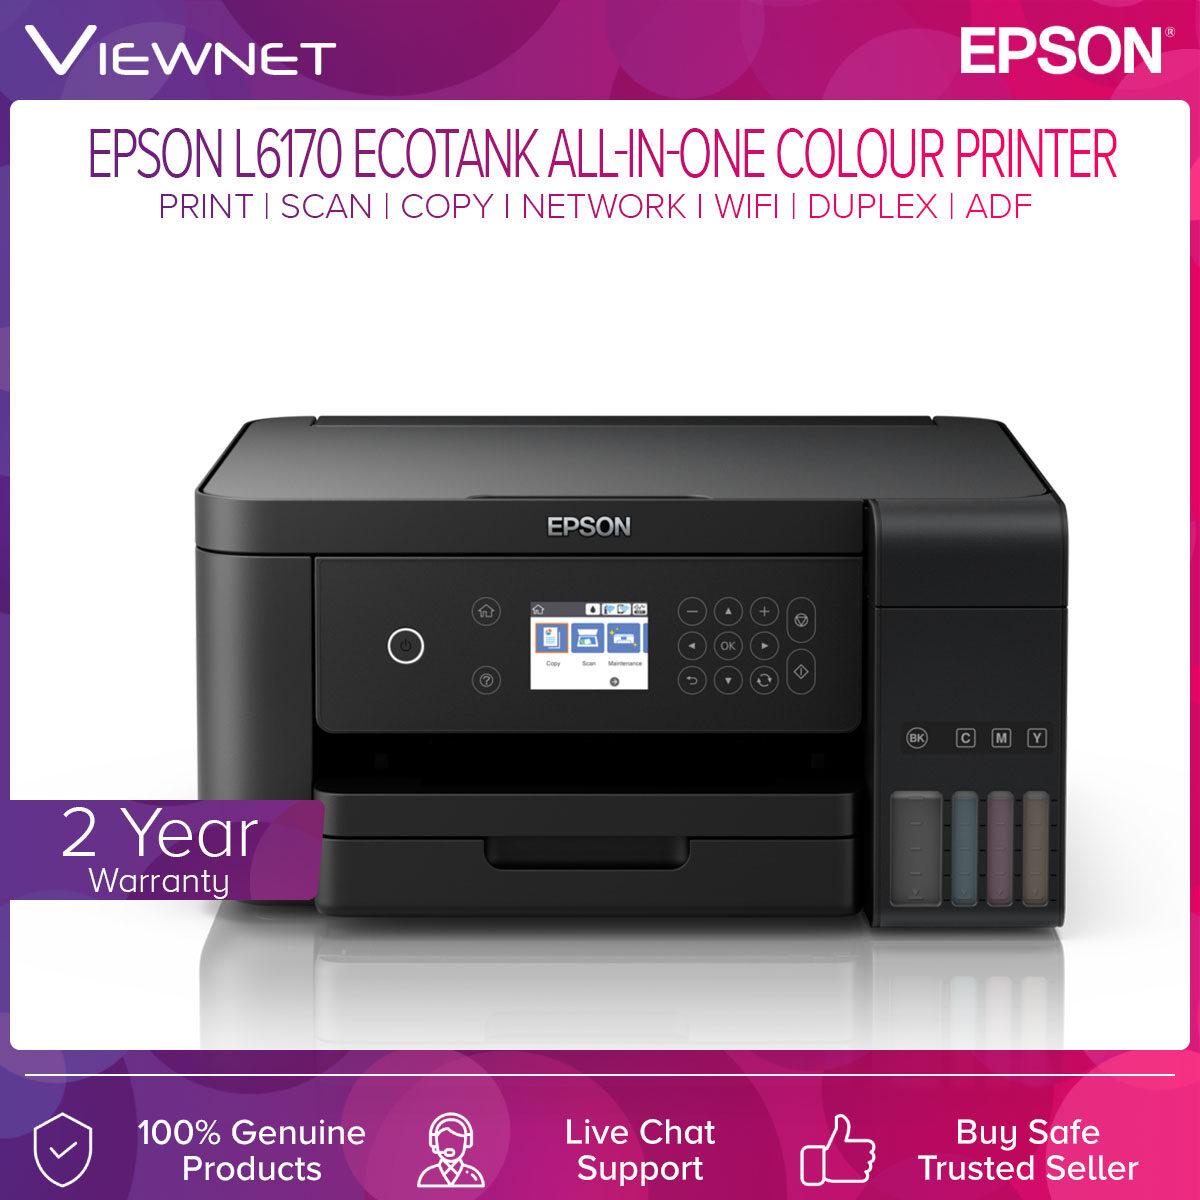 Epson EcoTank L6170 All-In-One Ink Tank Colour (Print/Scan/Copy/Network/Wi-Fi/Duplex/ADF) Printer